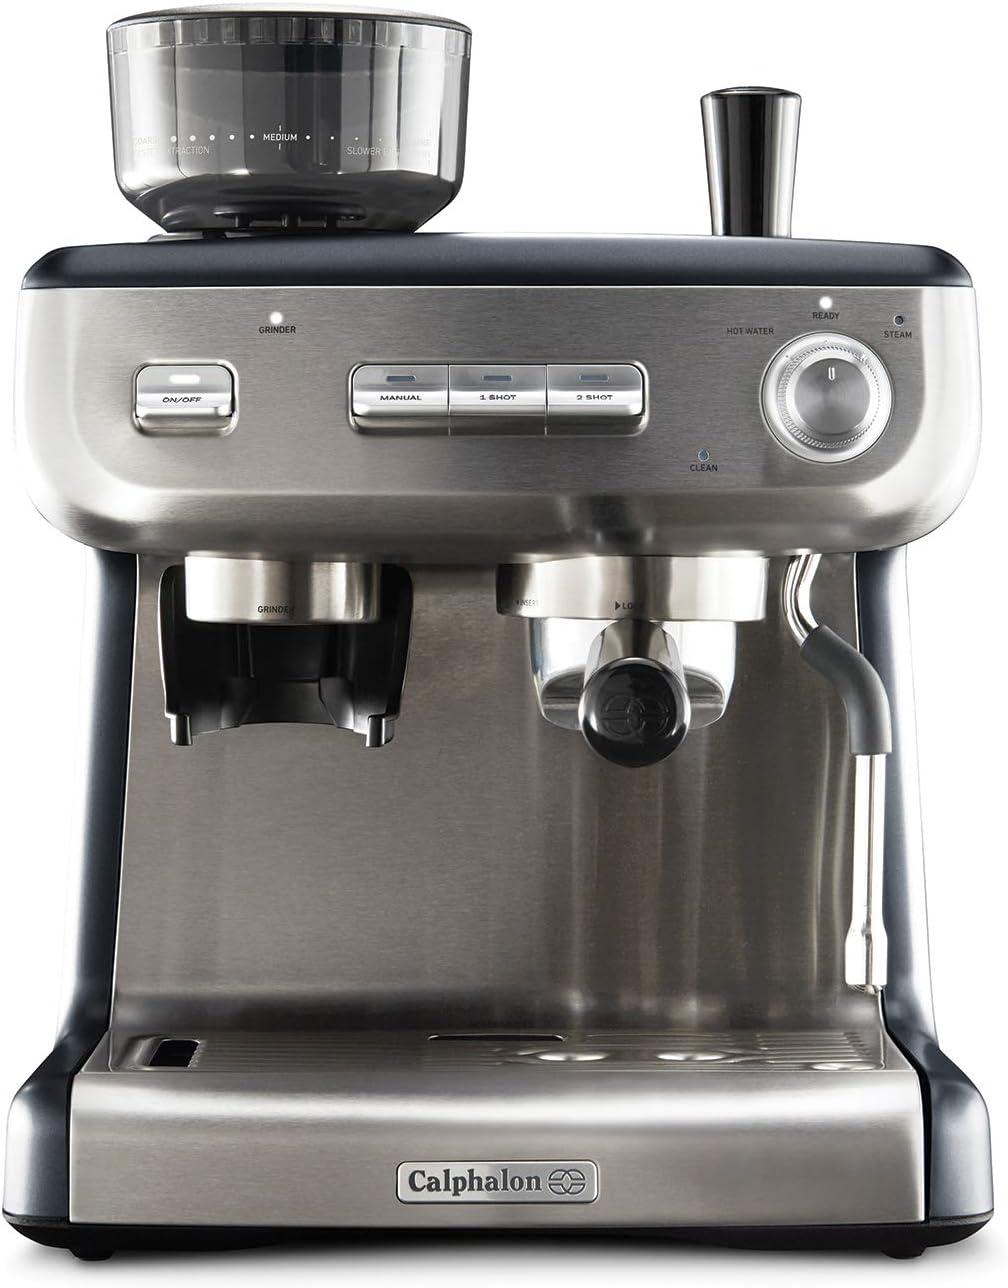 Calphalon BVCLECMPBM1 Temp iQ Espresso Machine with Grinder and Steam Wand